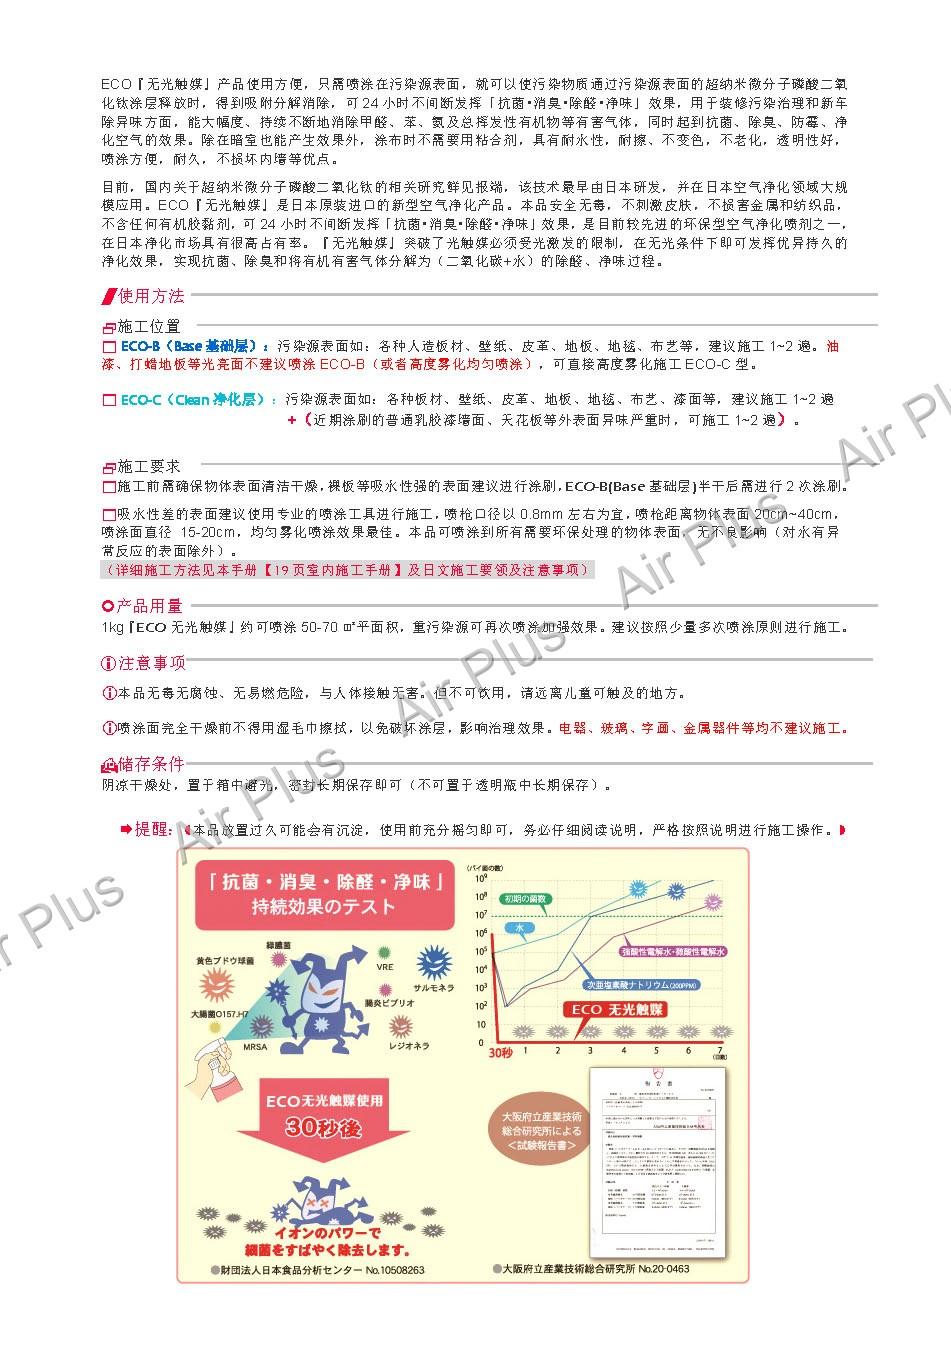 ★JP-ECO日本淨化製品-施工手册_页面_10.jpg